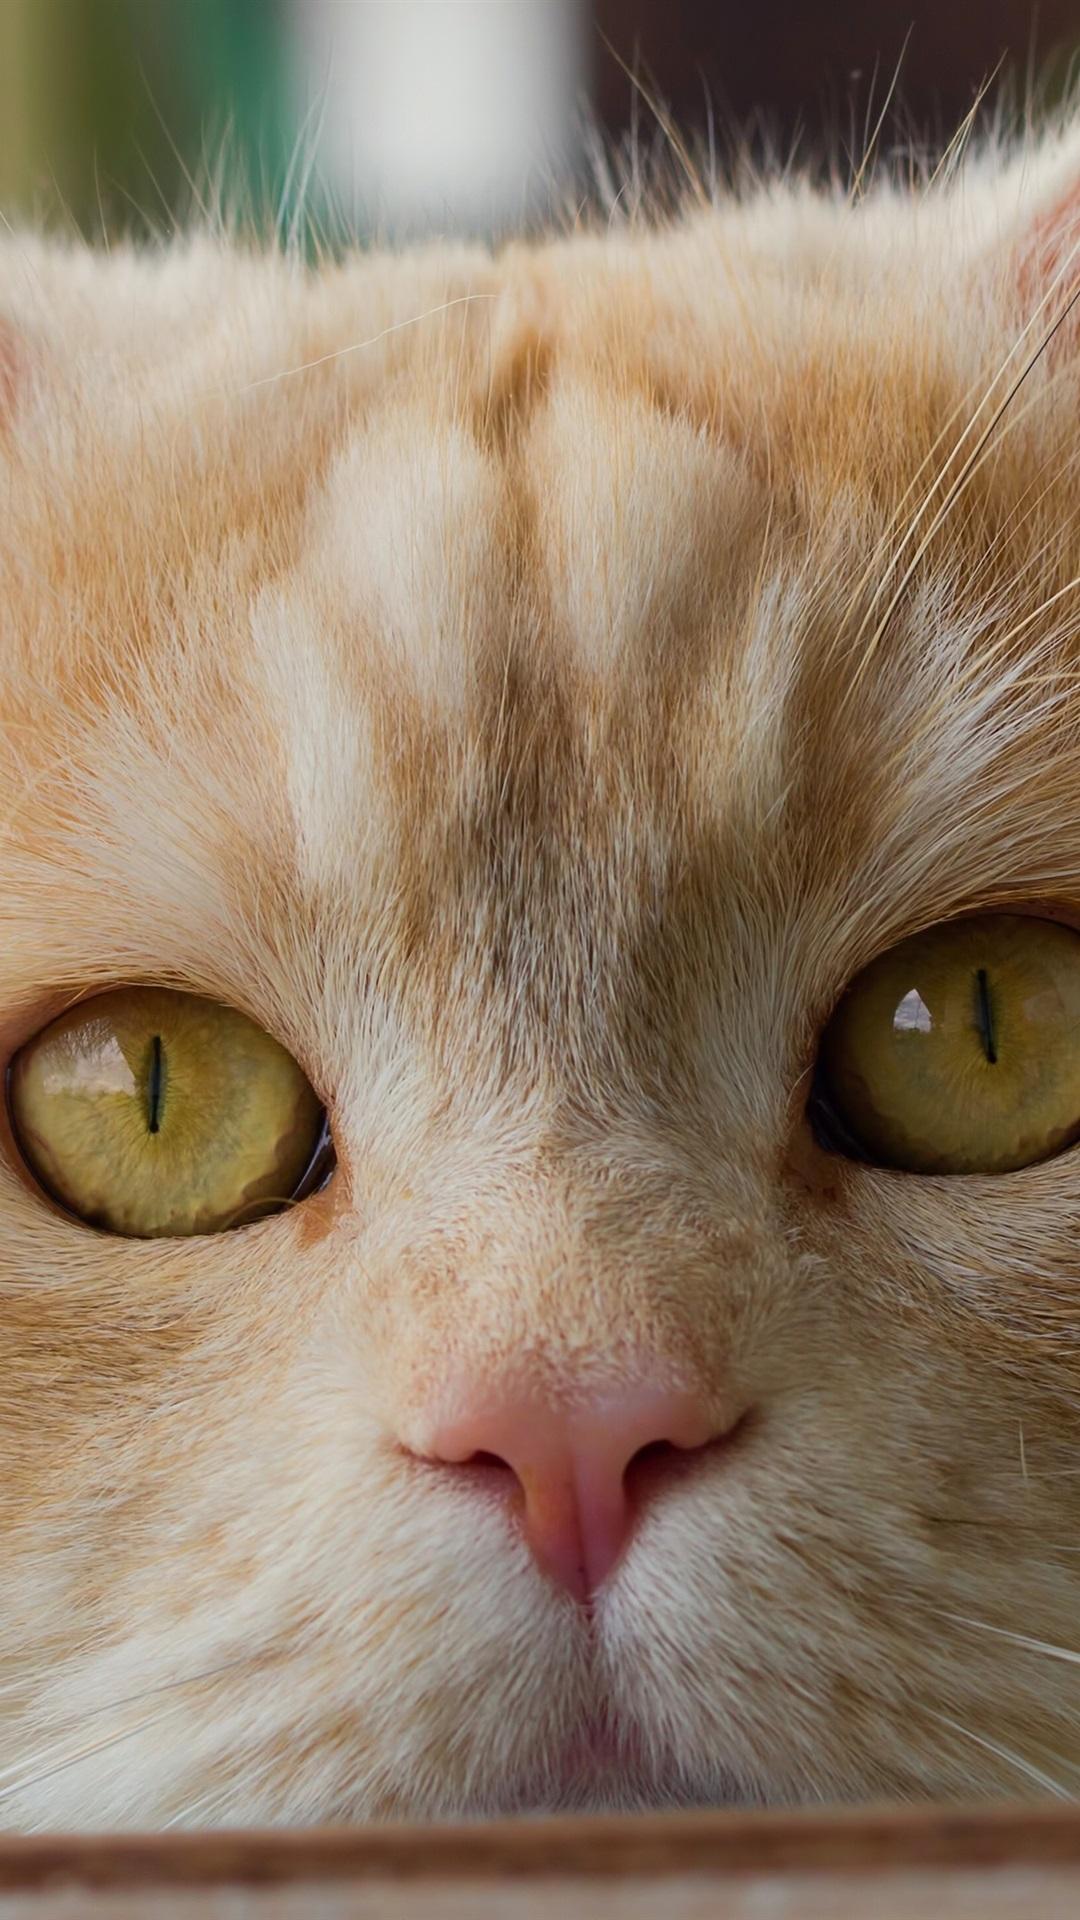 Cute Cat Face Close Up Yellow Eyes 1080x1920 Iphone 8 7 6